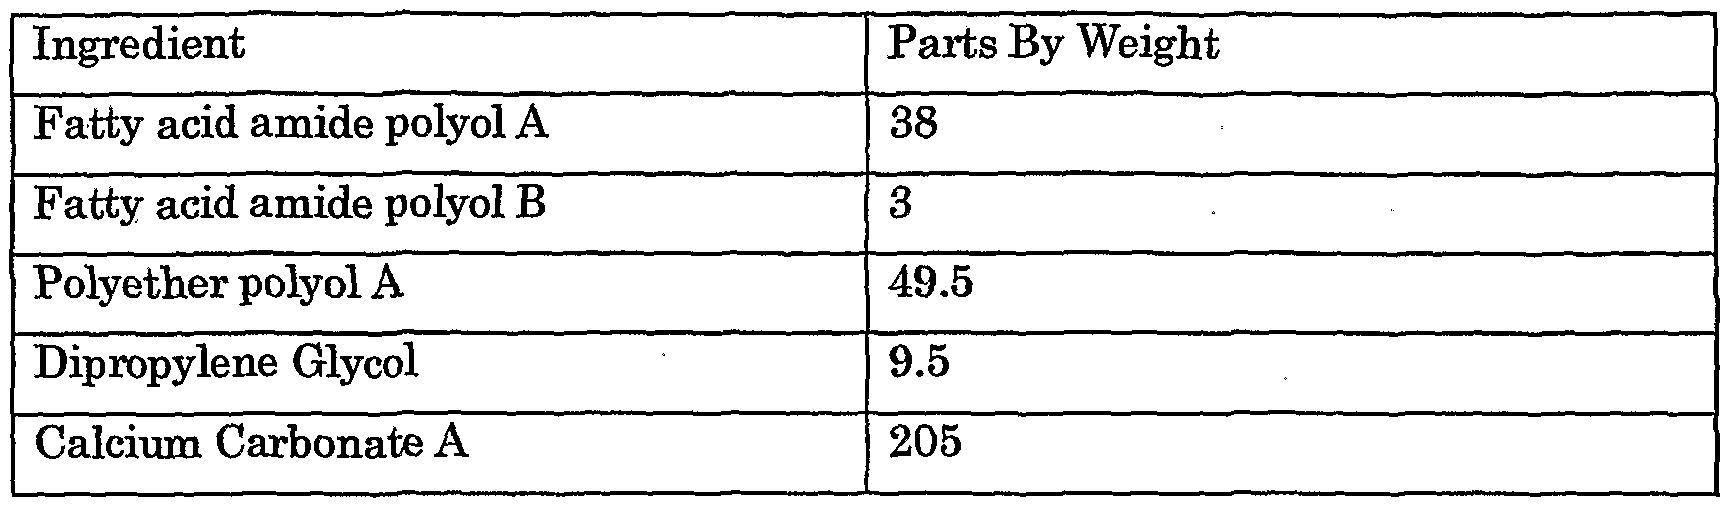 WO2005123798A1 - Polyurethane carpet backings made using fatty acid